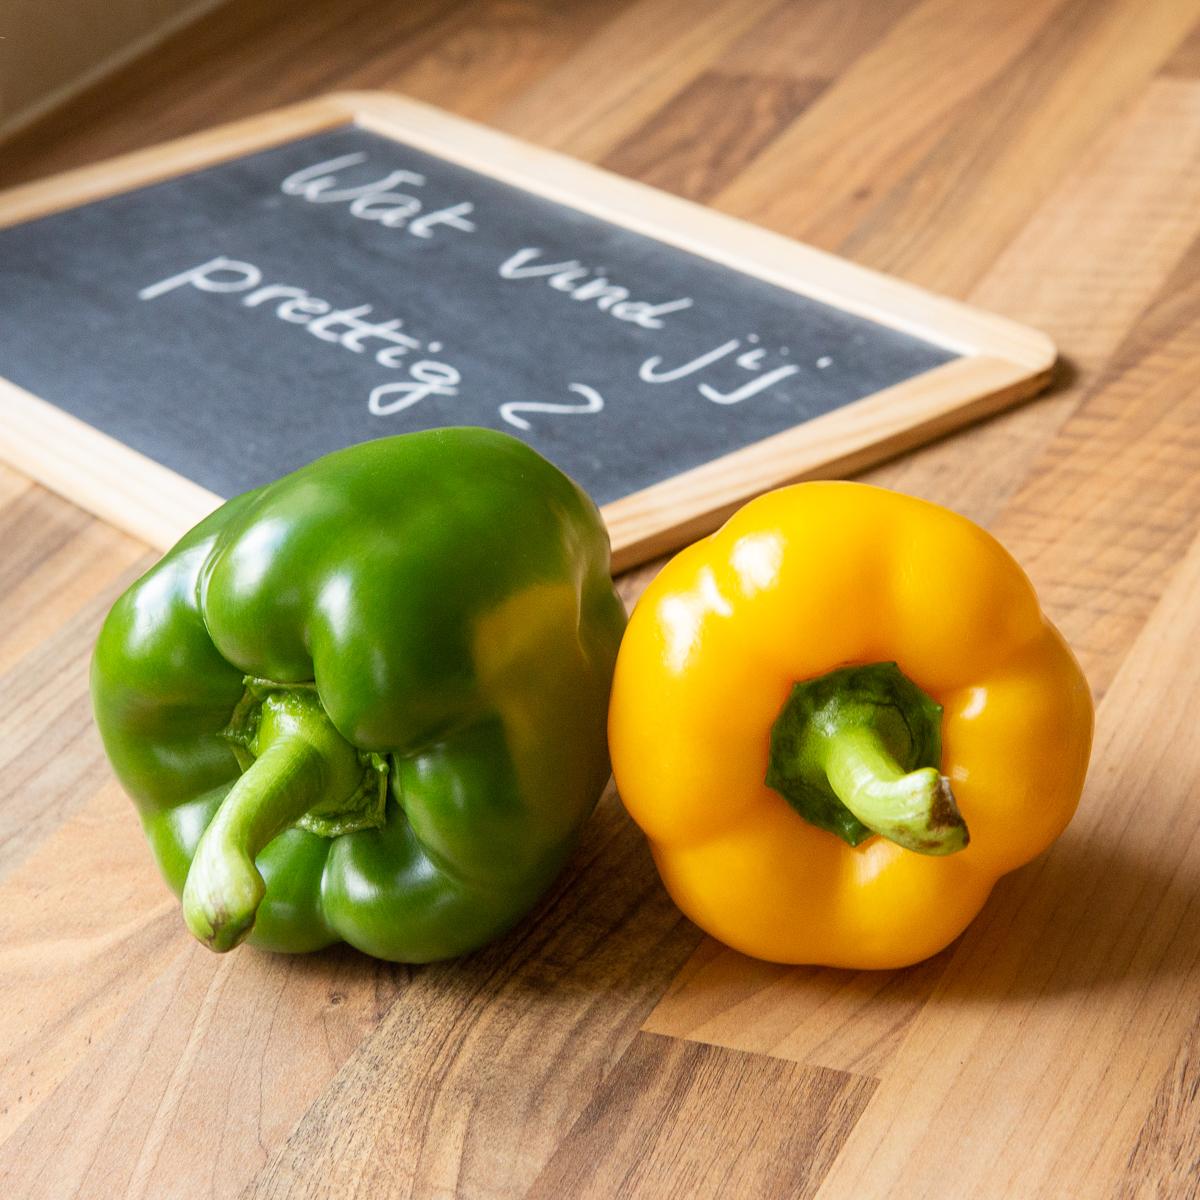 Foto bij blog: Gooi die groene paprika uit je aanbod - ZinVol (nuchtere ondernemerscoaching. Geen goeroegedoe.) Foto ©: Ada Luppen-Zyborowicz.